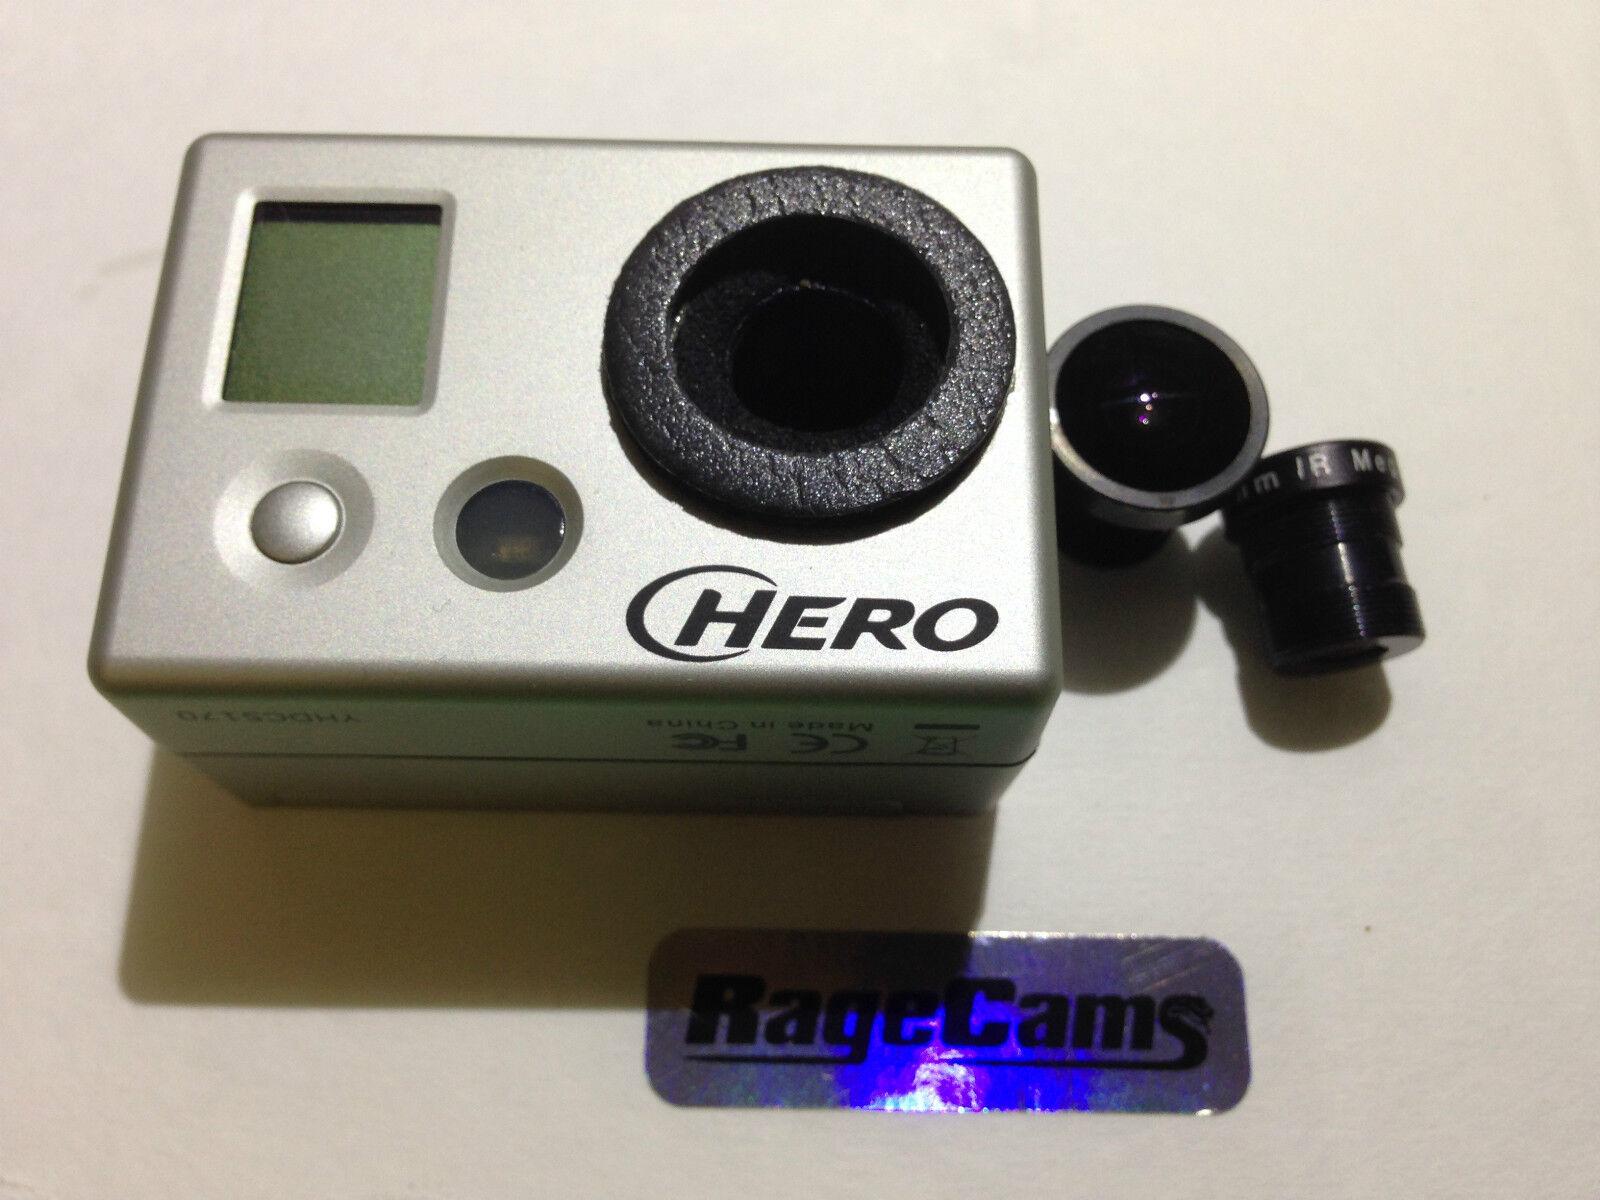 Gopro HD Hero Cámara Caza Cambio de Lentes Lentes Lentes Modificado Ragecams Zoom 12MM 903712